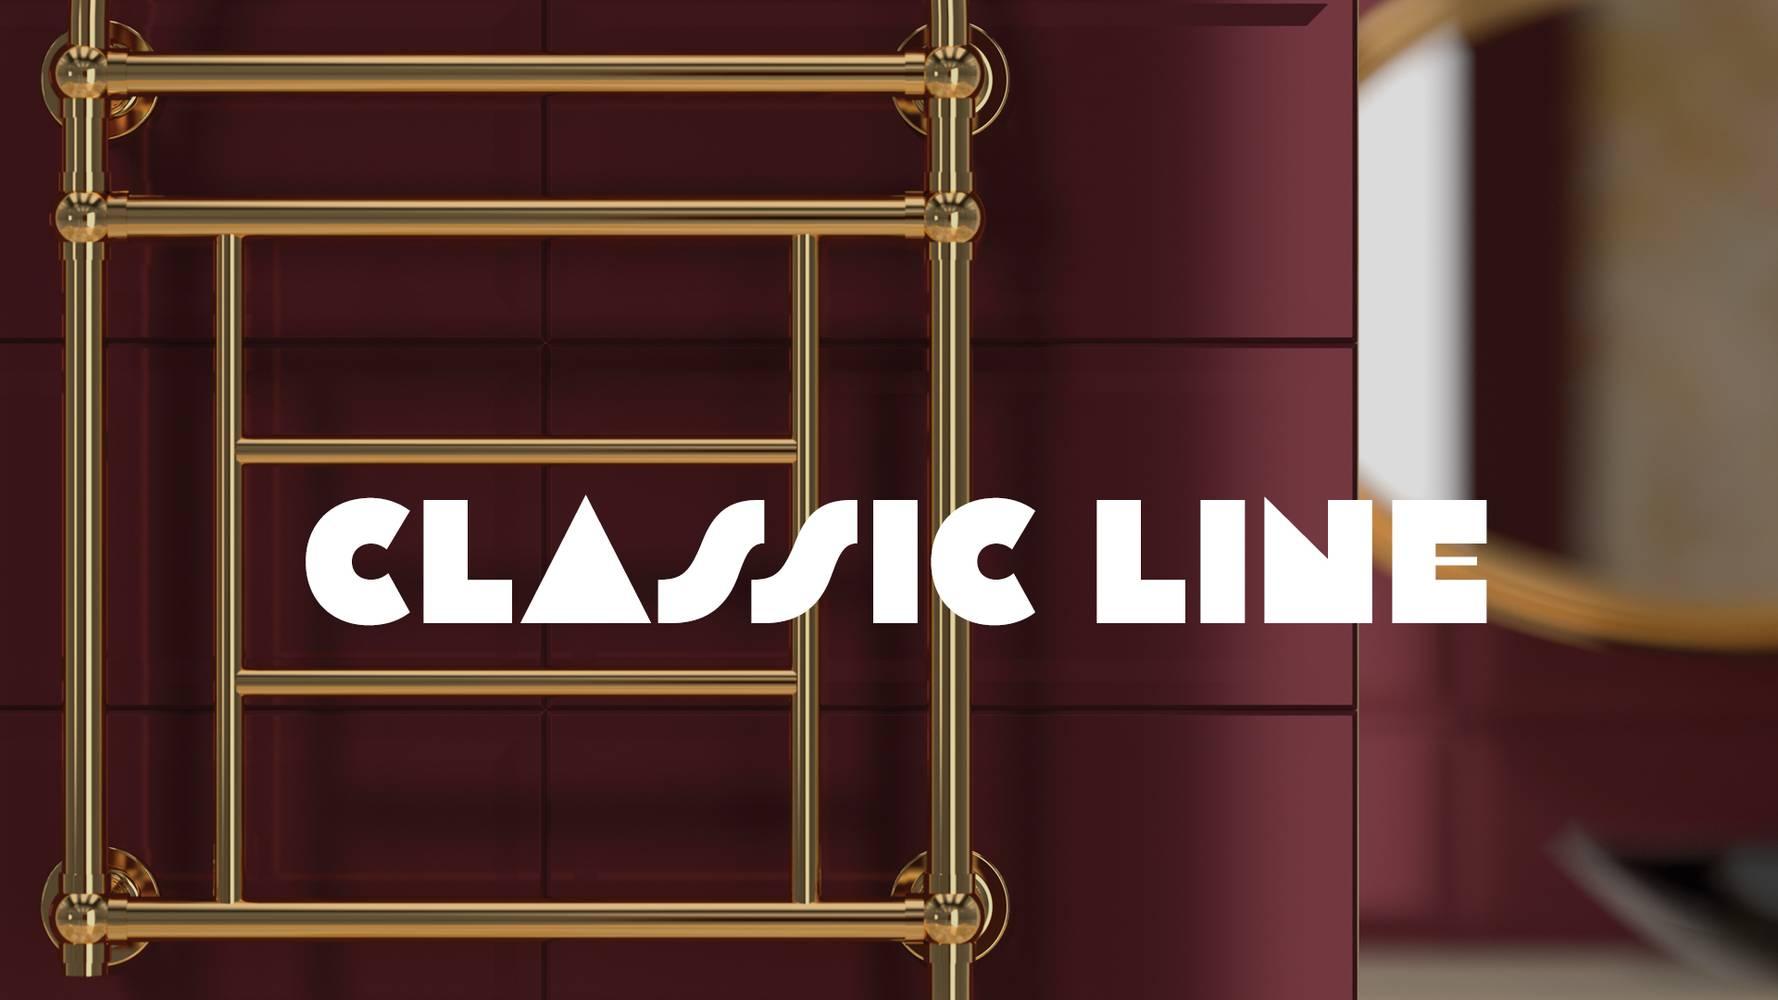 CLASSIC LINE